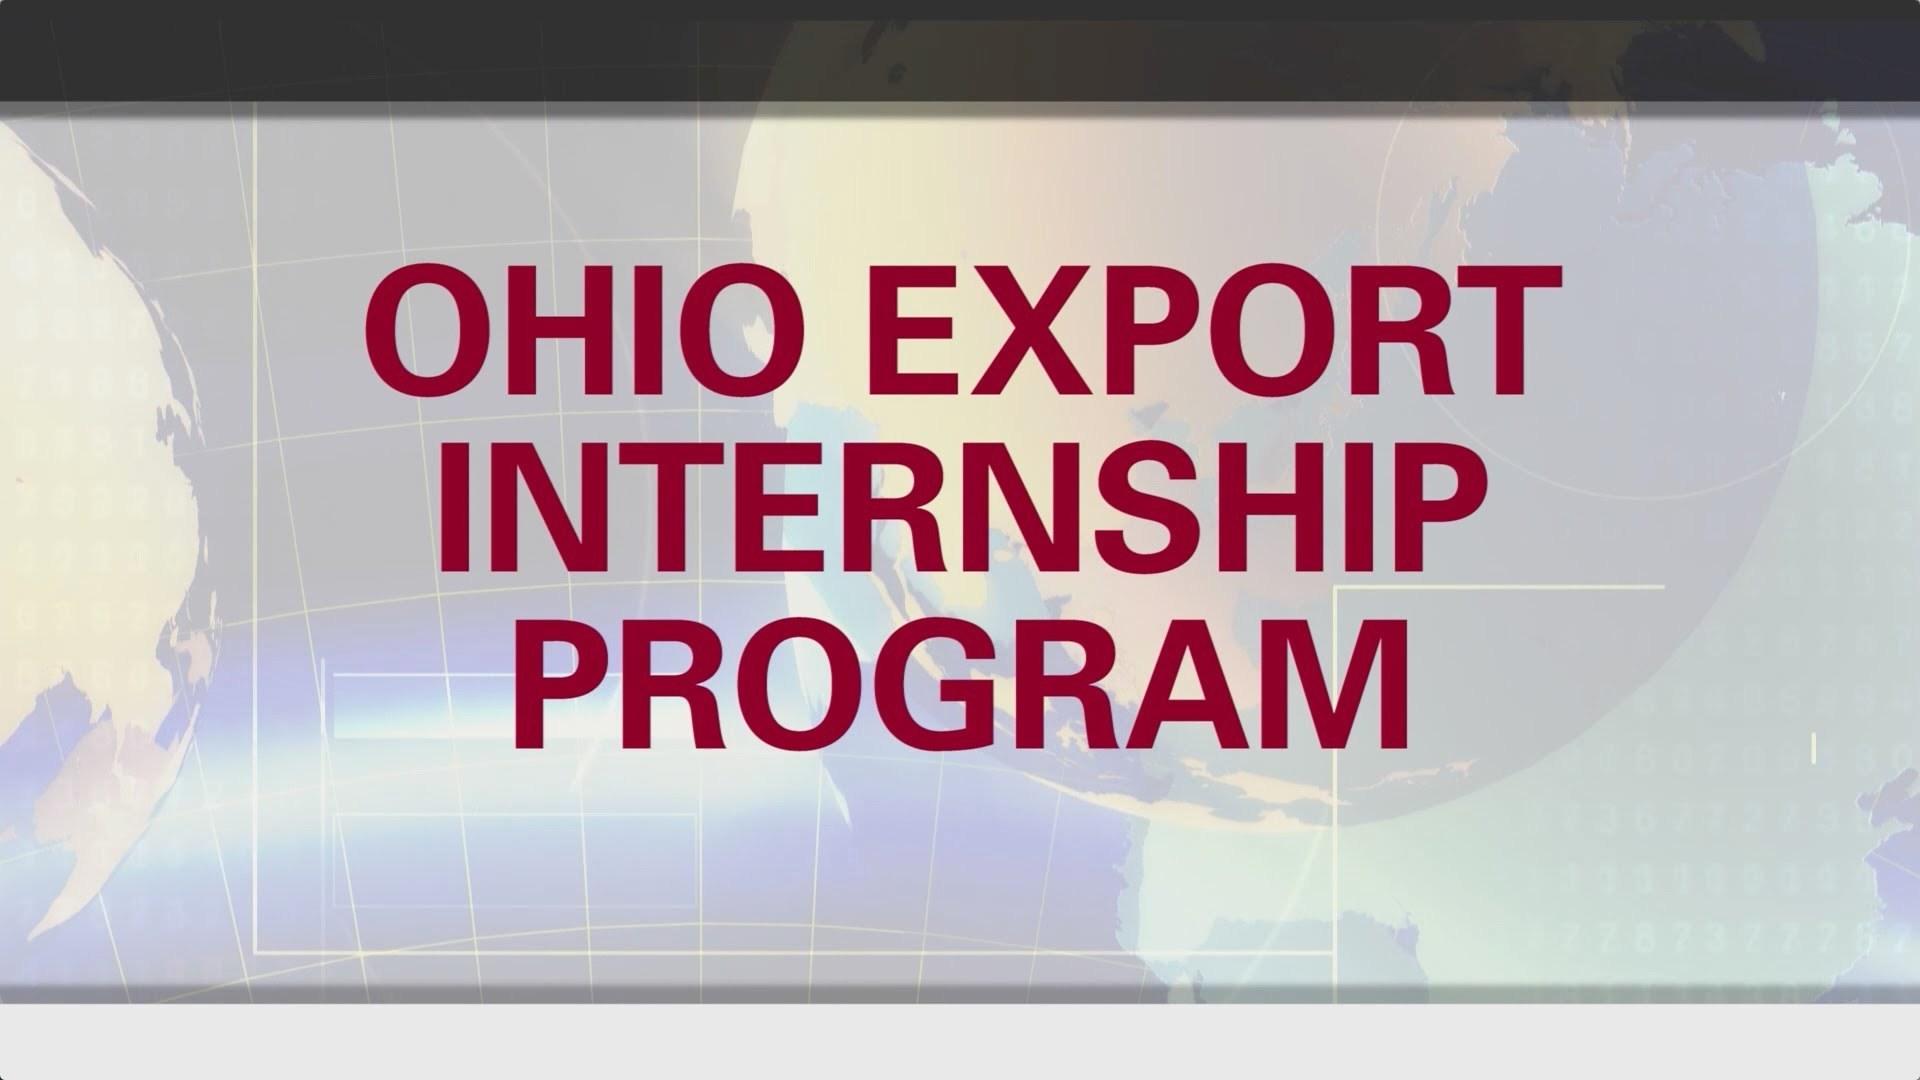 Ohio export internship program